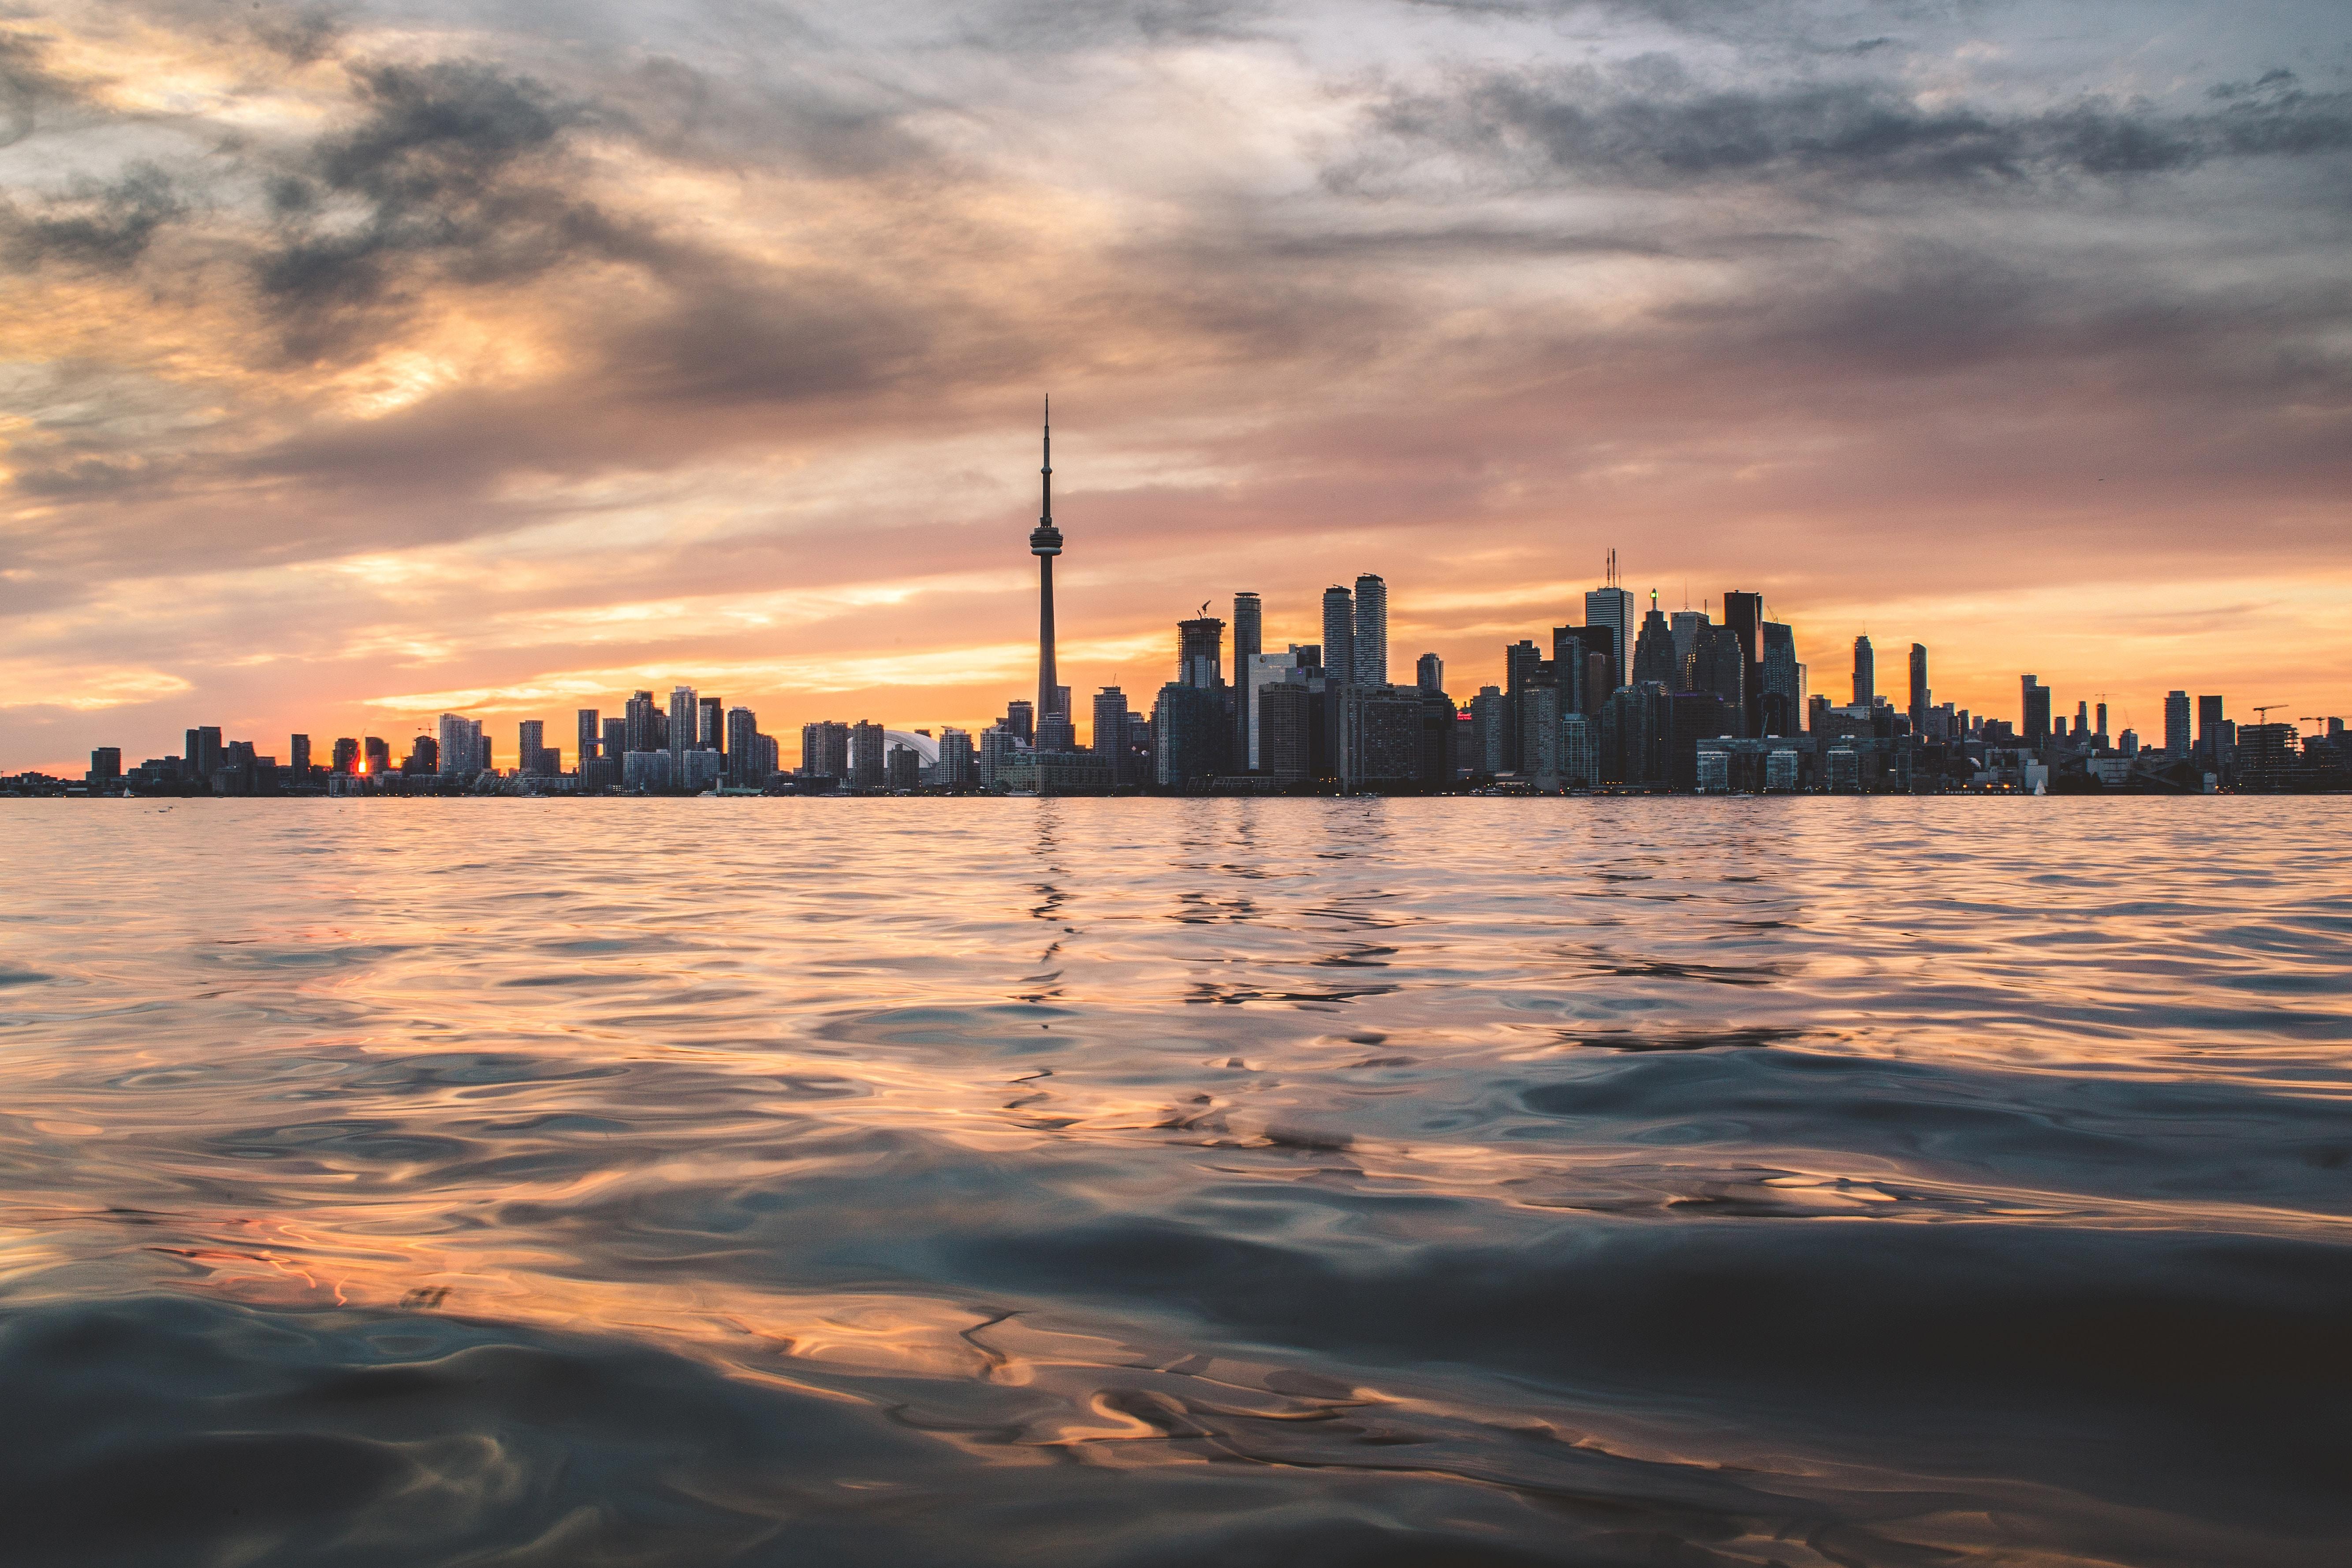 Toronto photo by Berkay Gumustekin